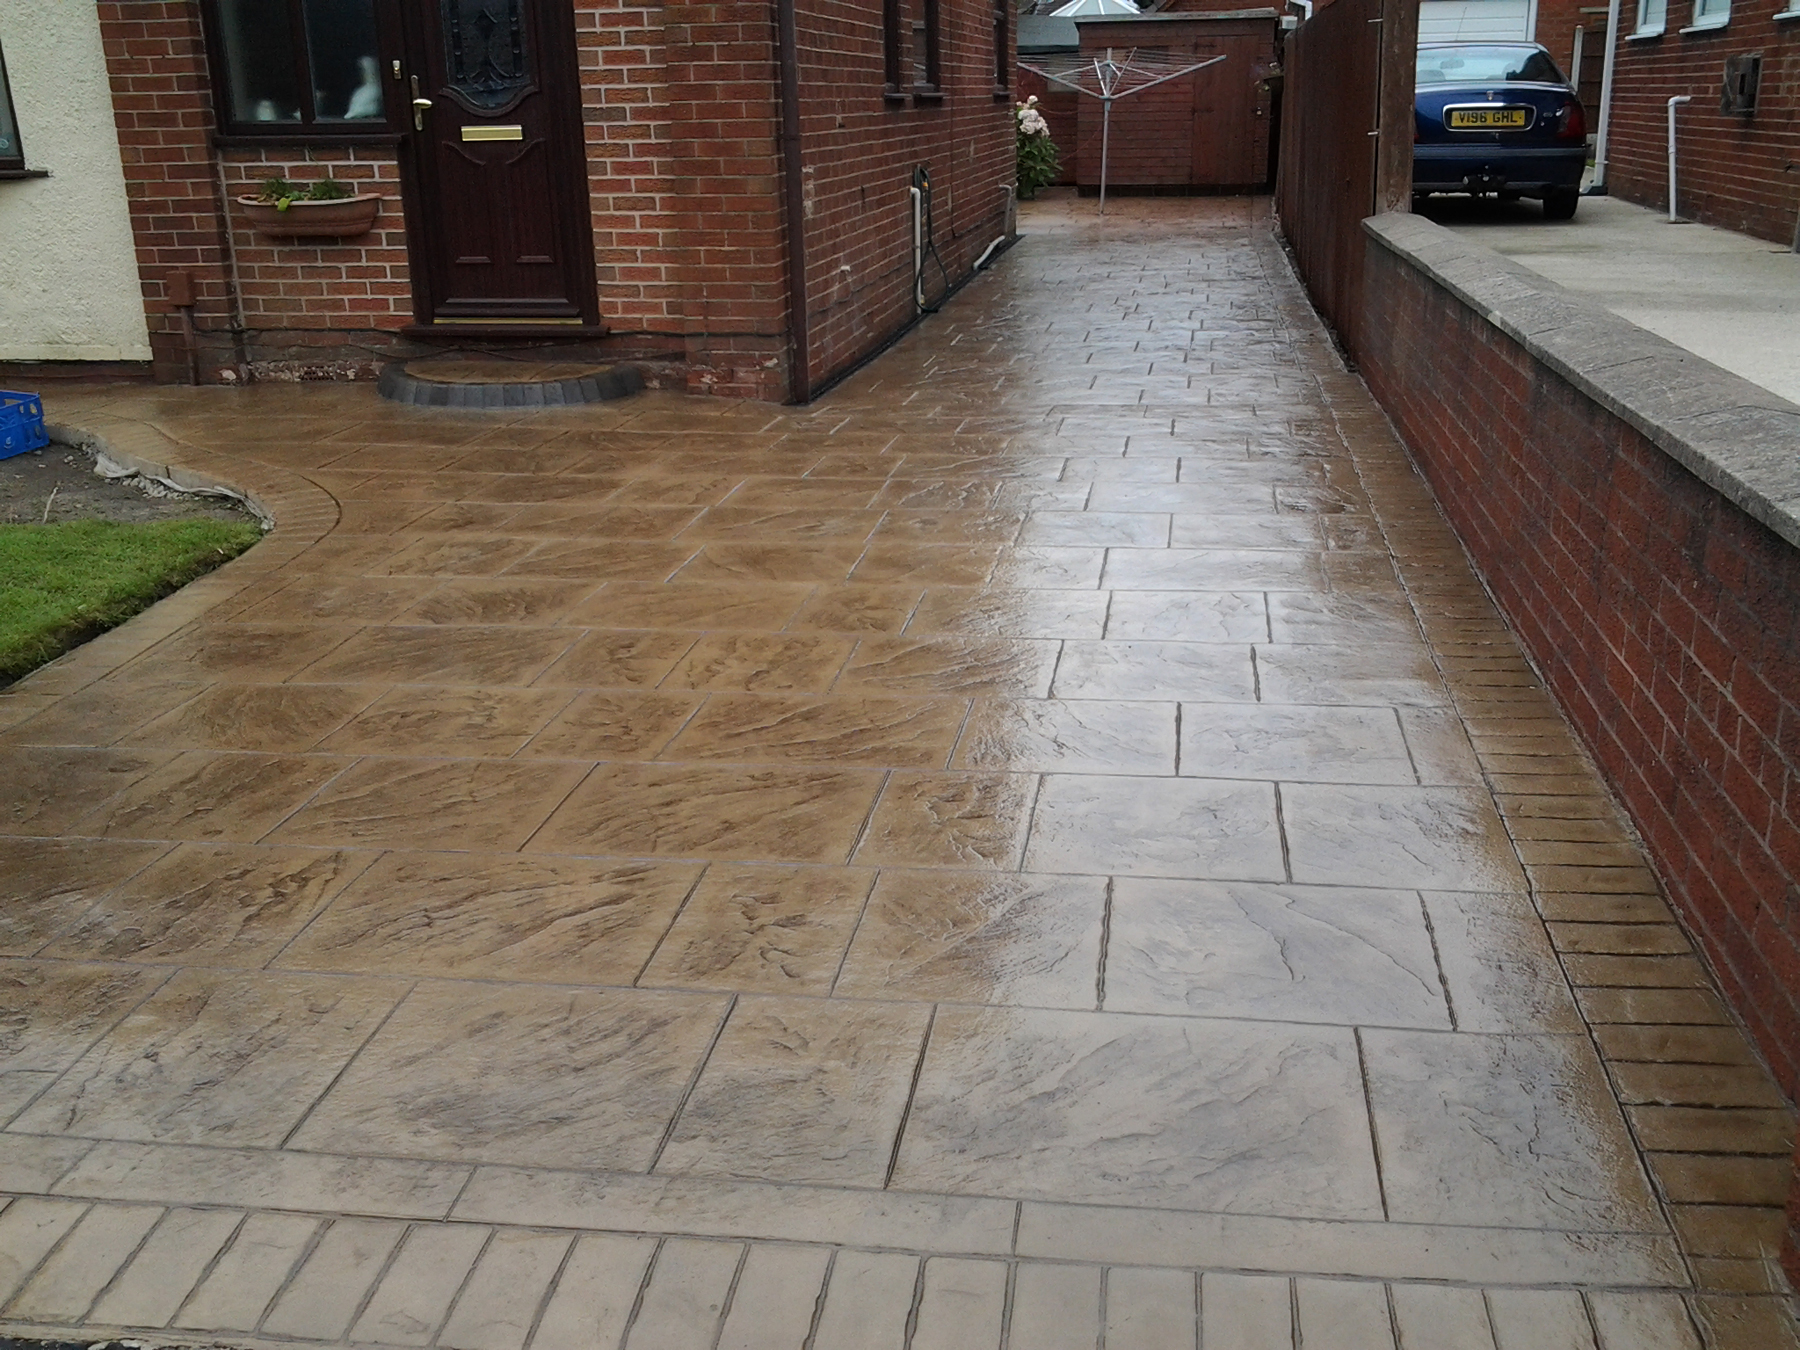 Printed Concrete Driveway >> Pattern Imprinted Concrete Driveways Wigan Dhad